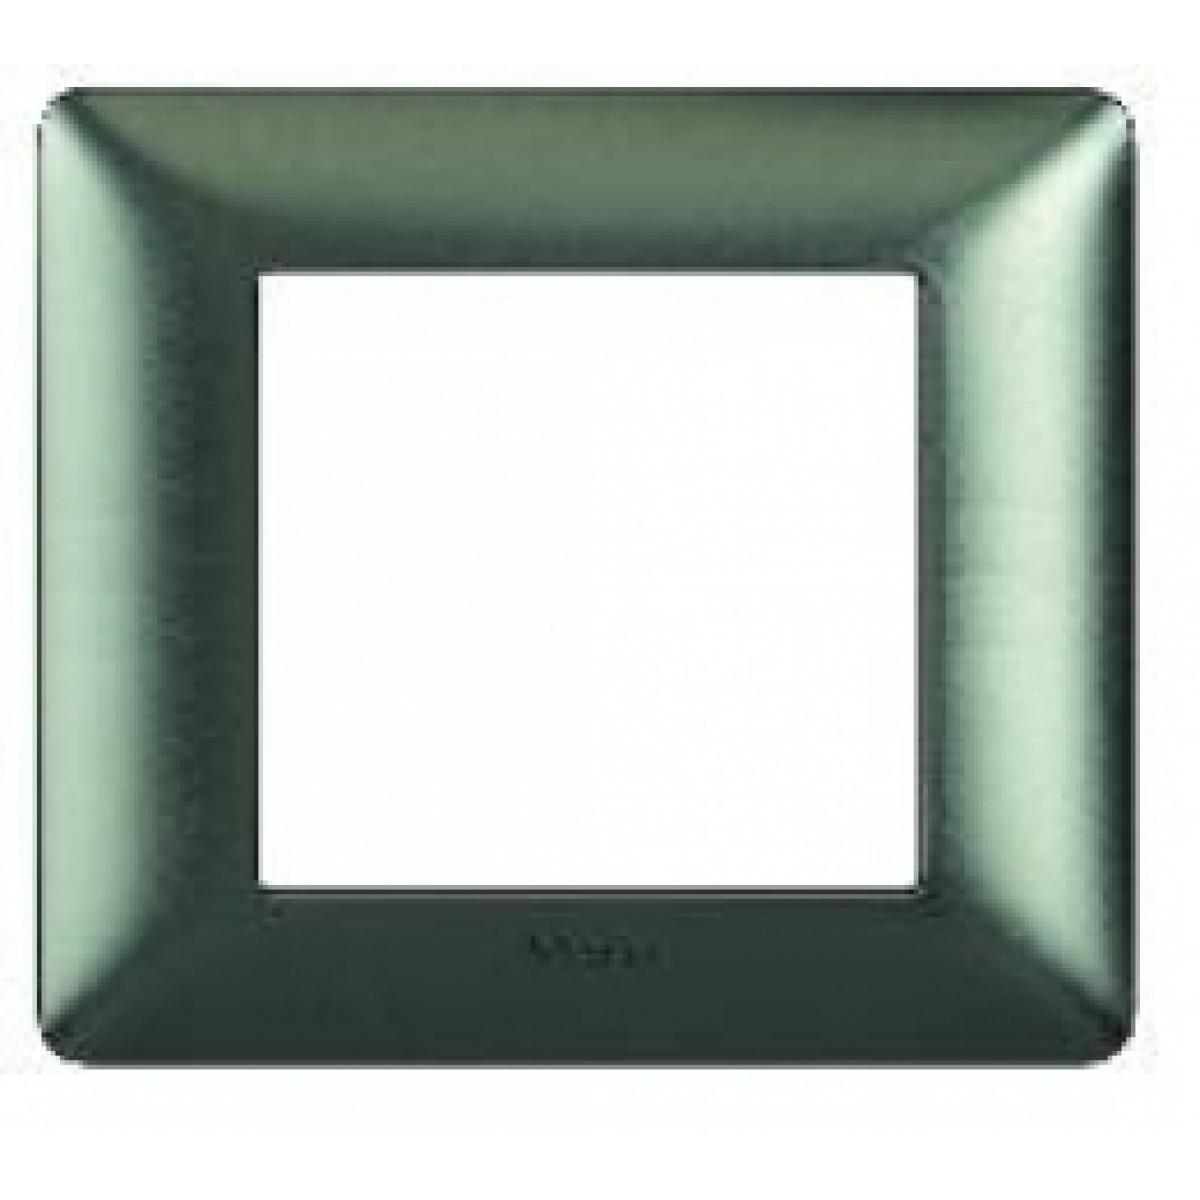 Matix bticino placca 3+3 poli colore nichel nero AM4826GNN